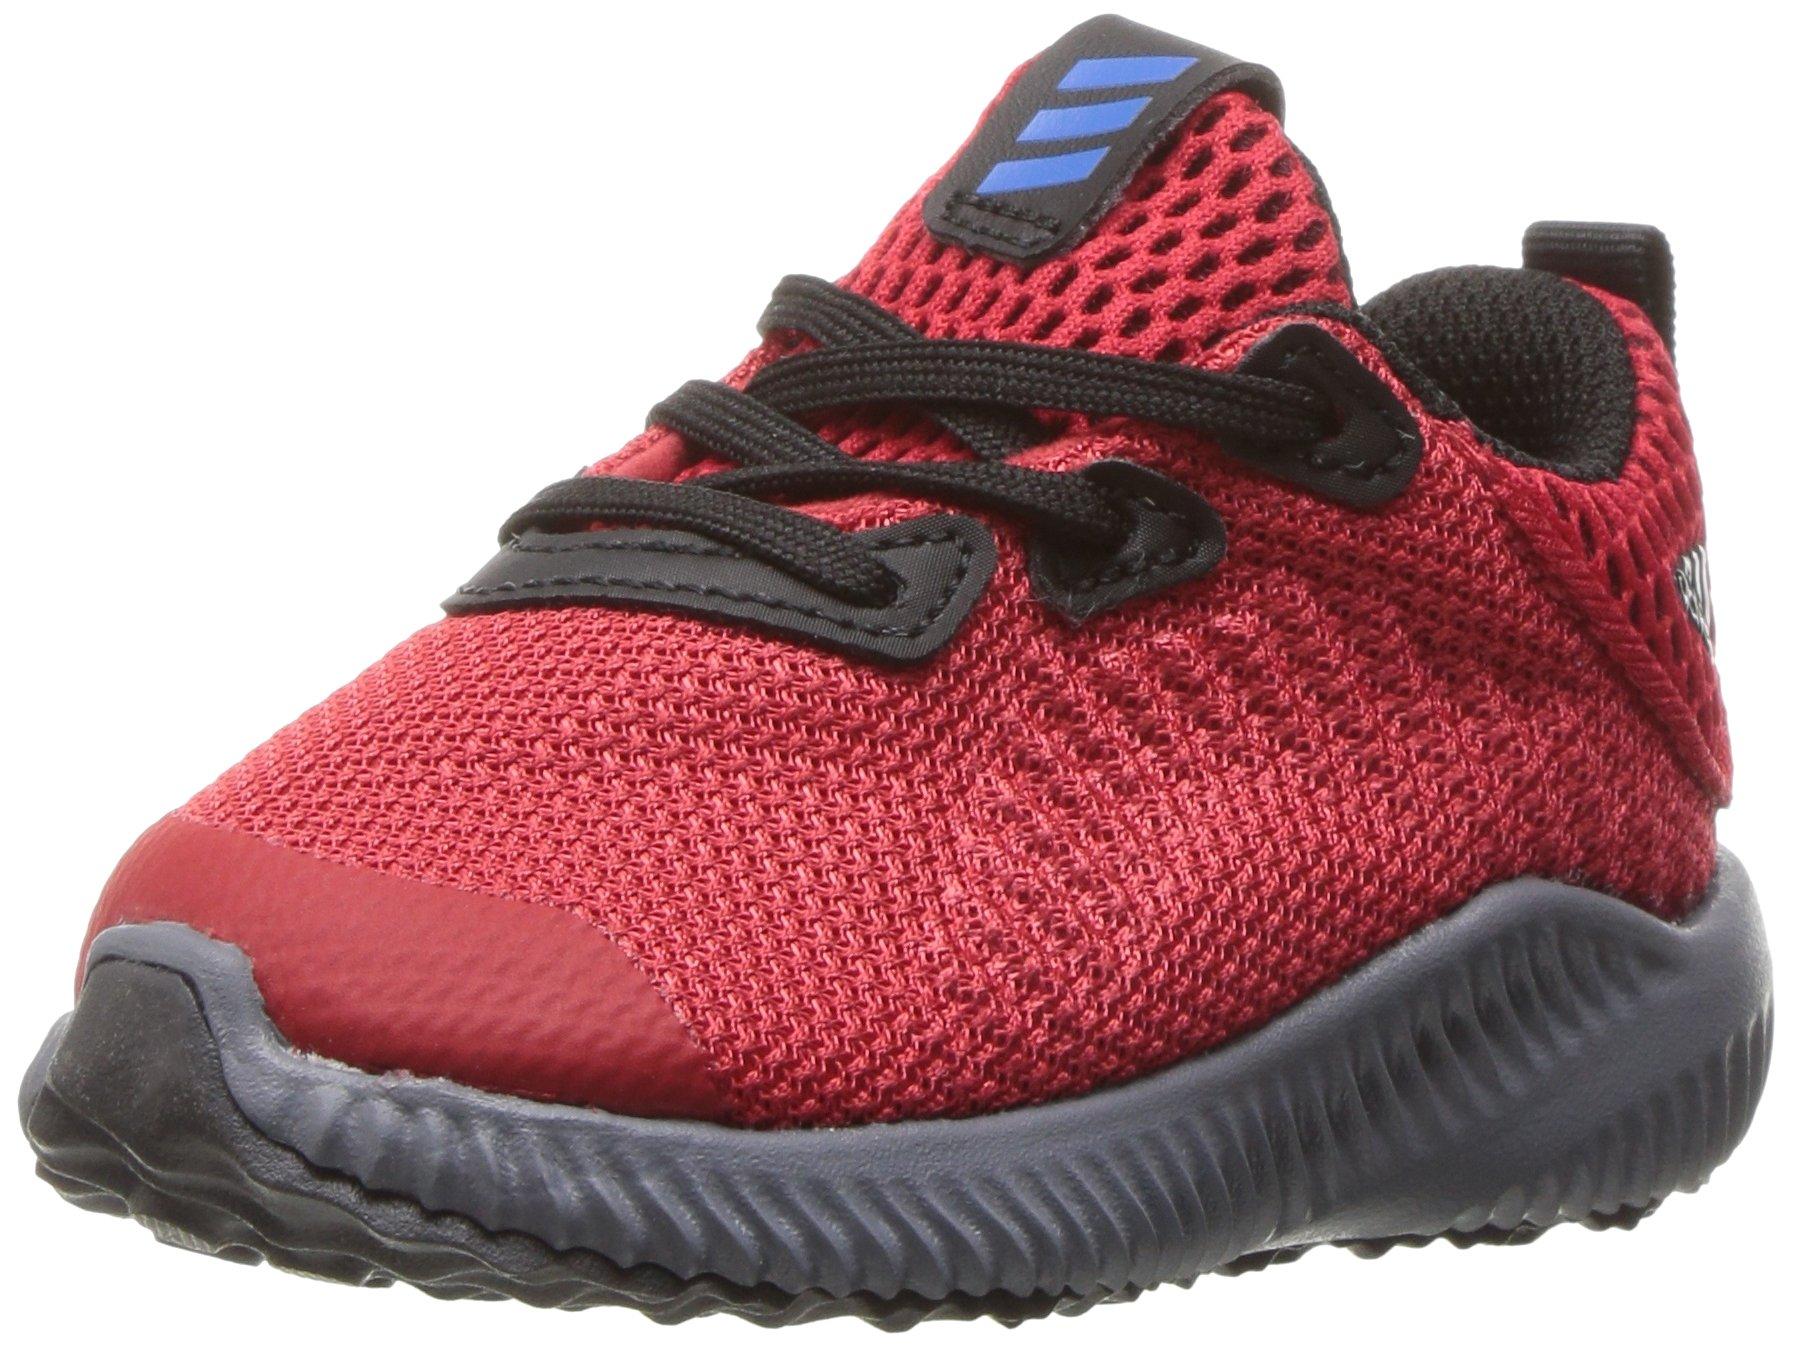 adidas Kids' Alphabounce Sneaker, Scarlet/Satellite/Black, 8 M US Toddler